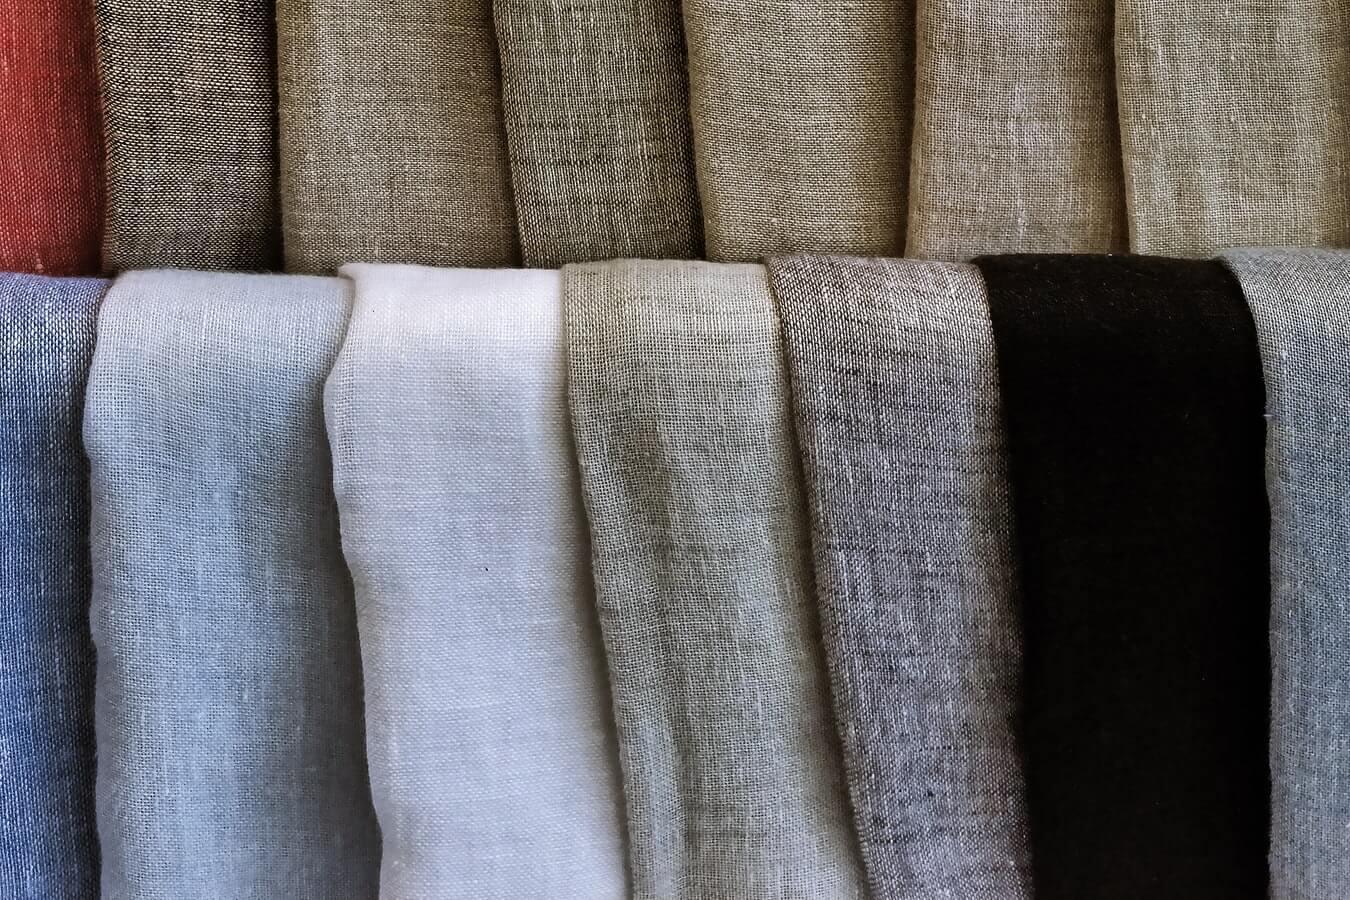 Linen. The Specifics Of the Fiber